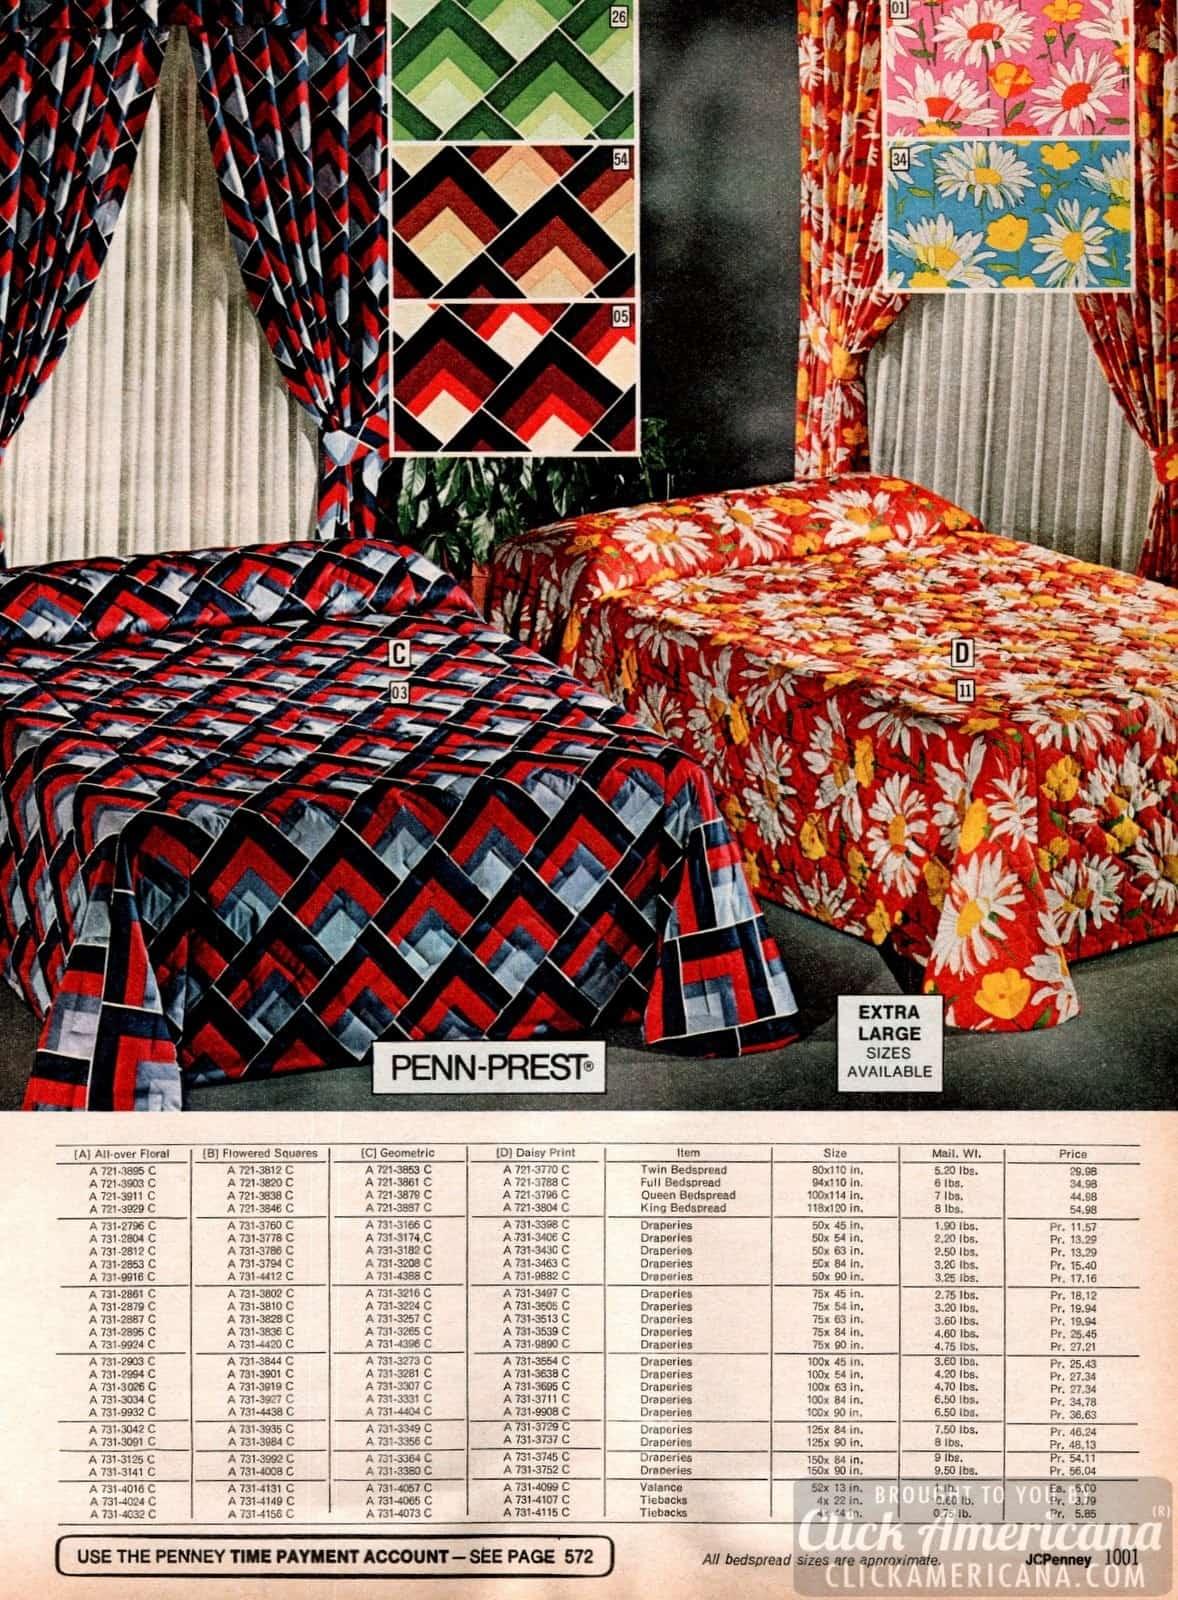 70s geometric print and huge daisy print bedspreads